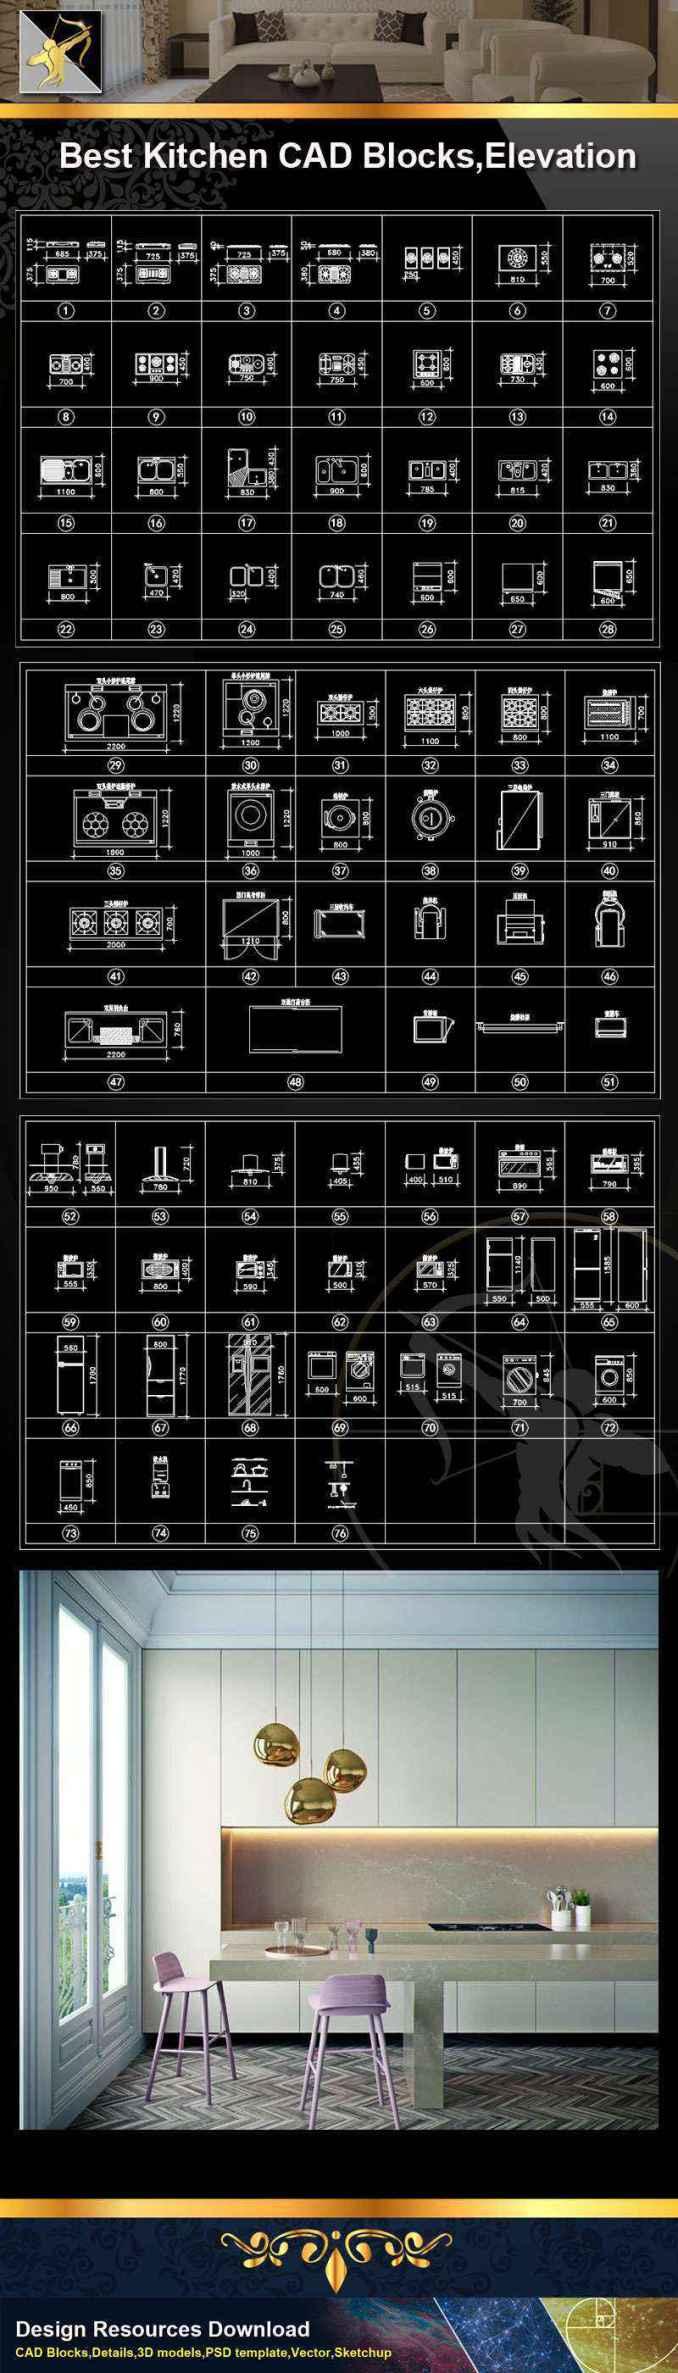 ★【Kitchen CAD Blocks】@Autocad Blocks,Drawings,CAD Details,Elevation